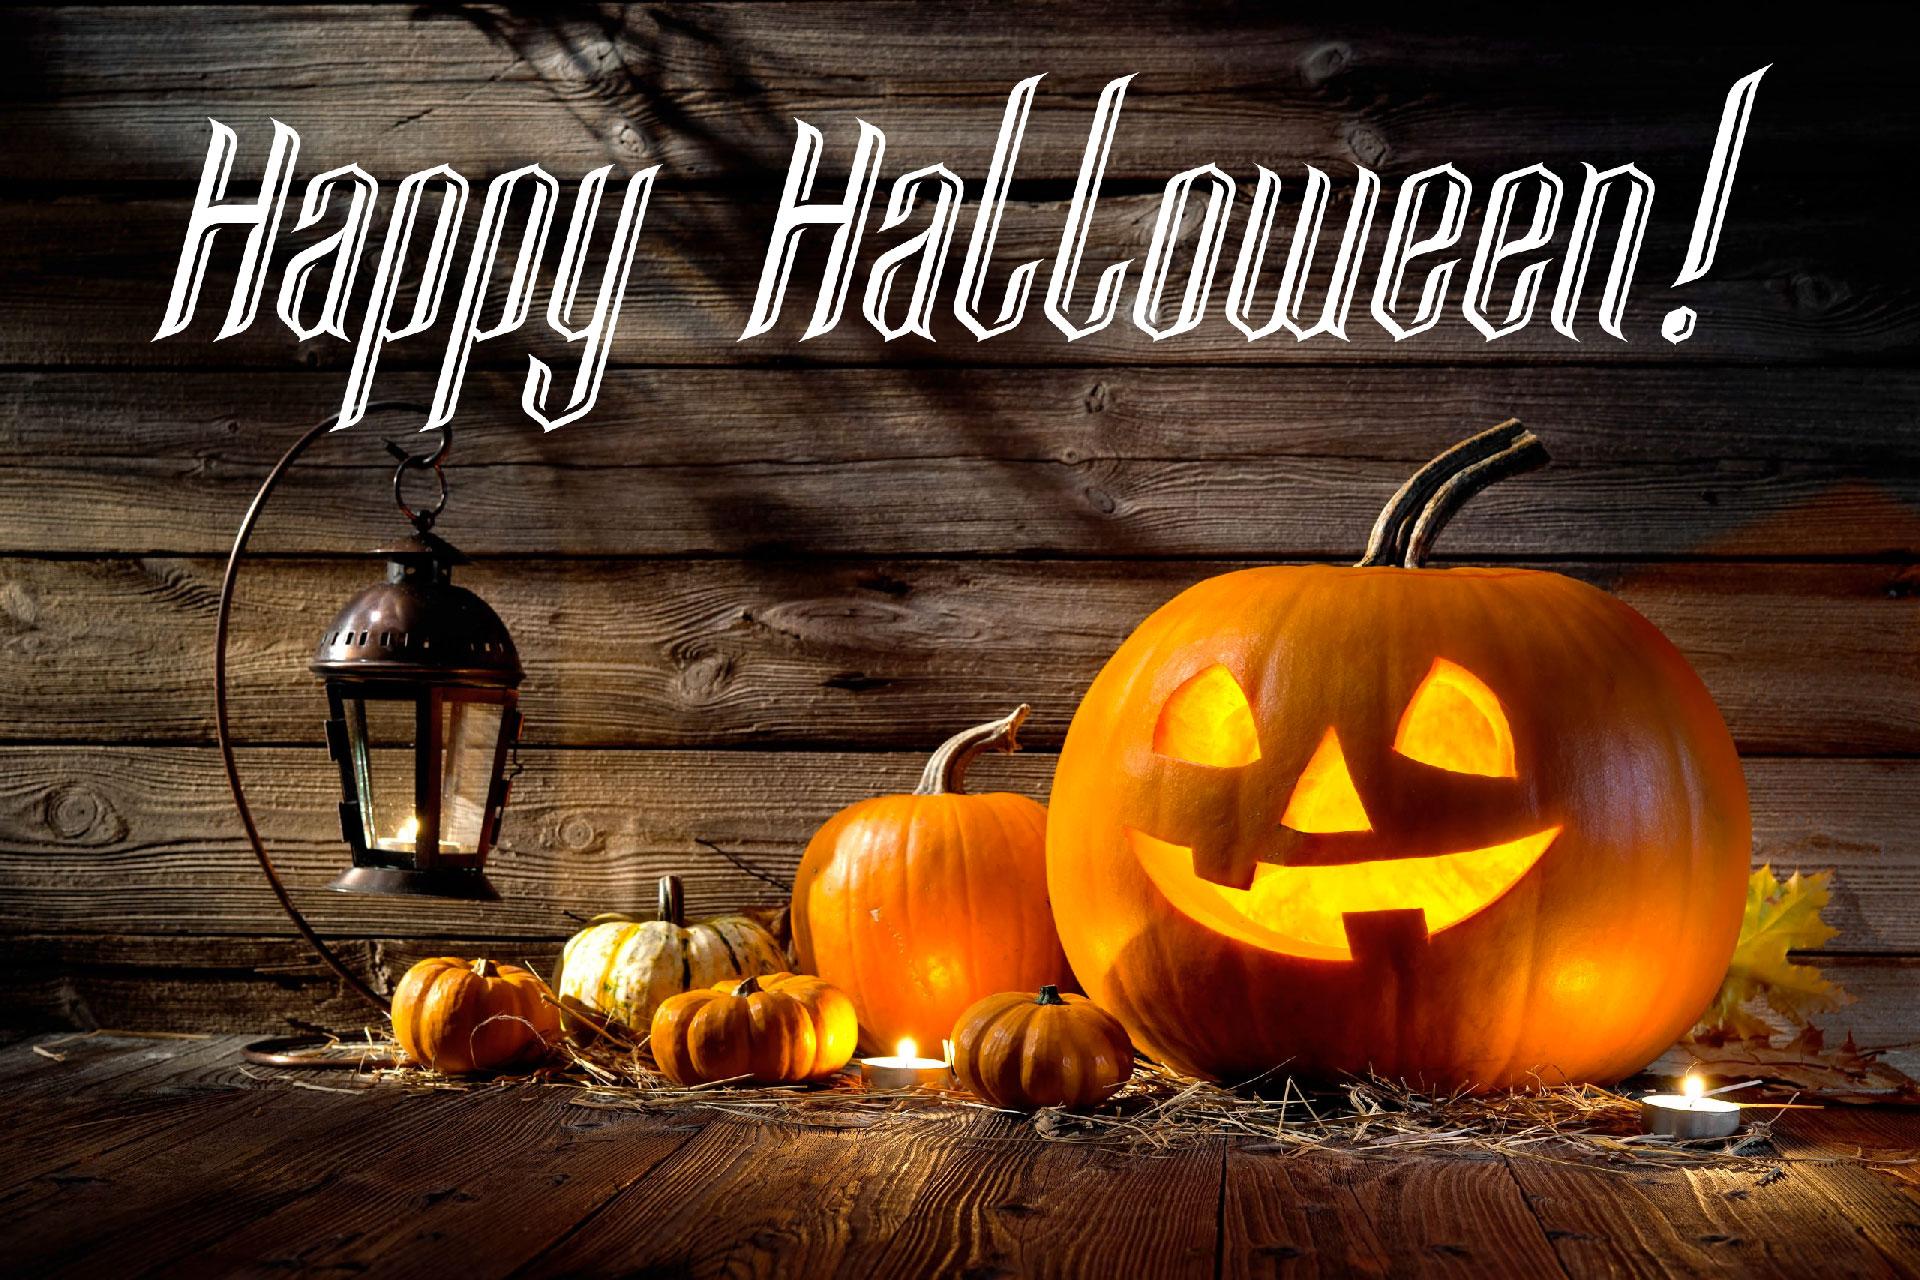 Happy Halloween from The Storage Inn of EHT